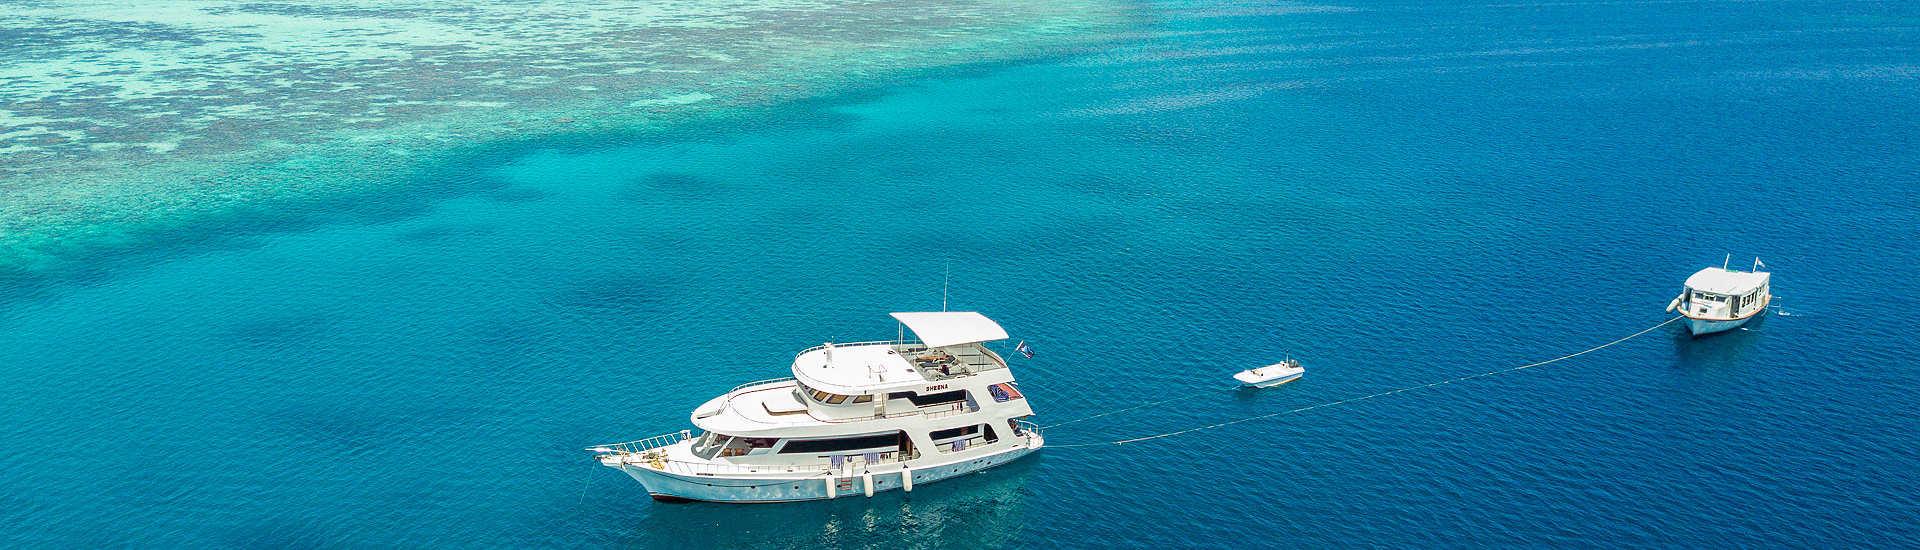 MY Sheena mit Dhoni im Schlepptau – Safarischiff Malediven